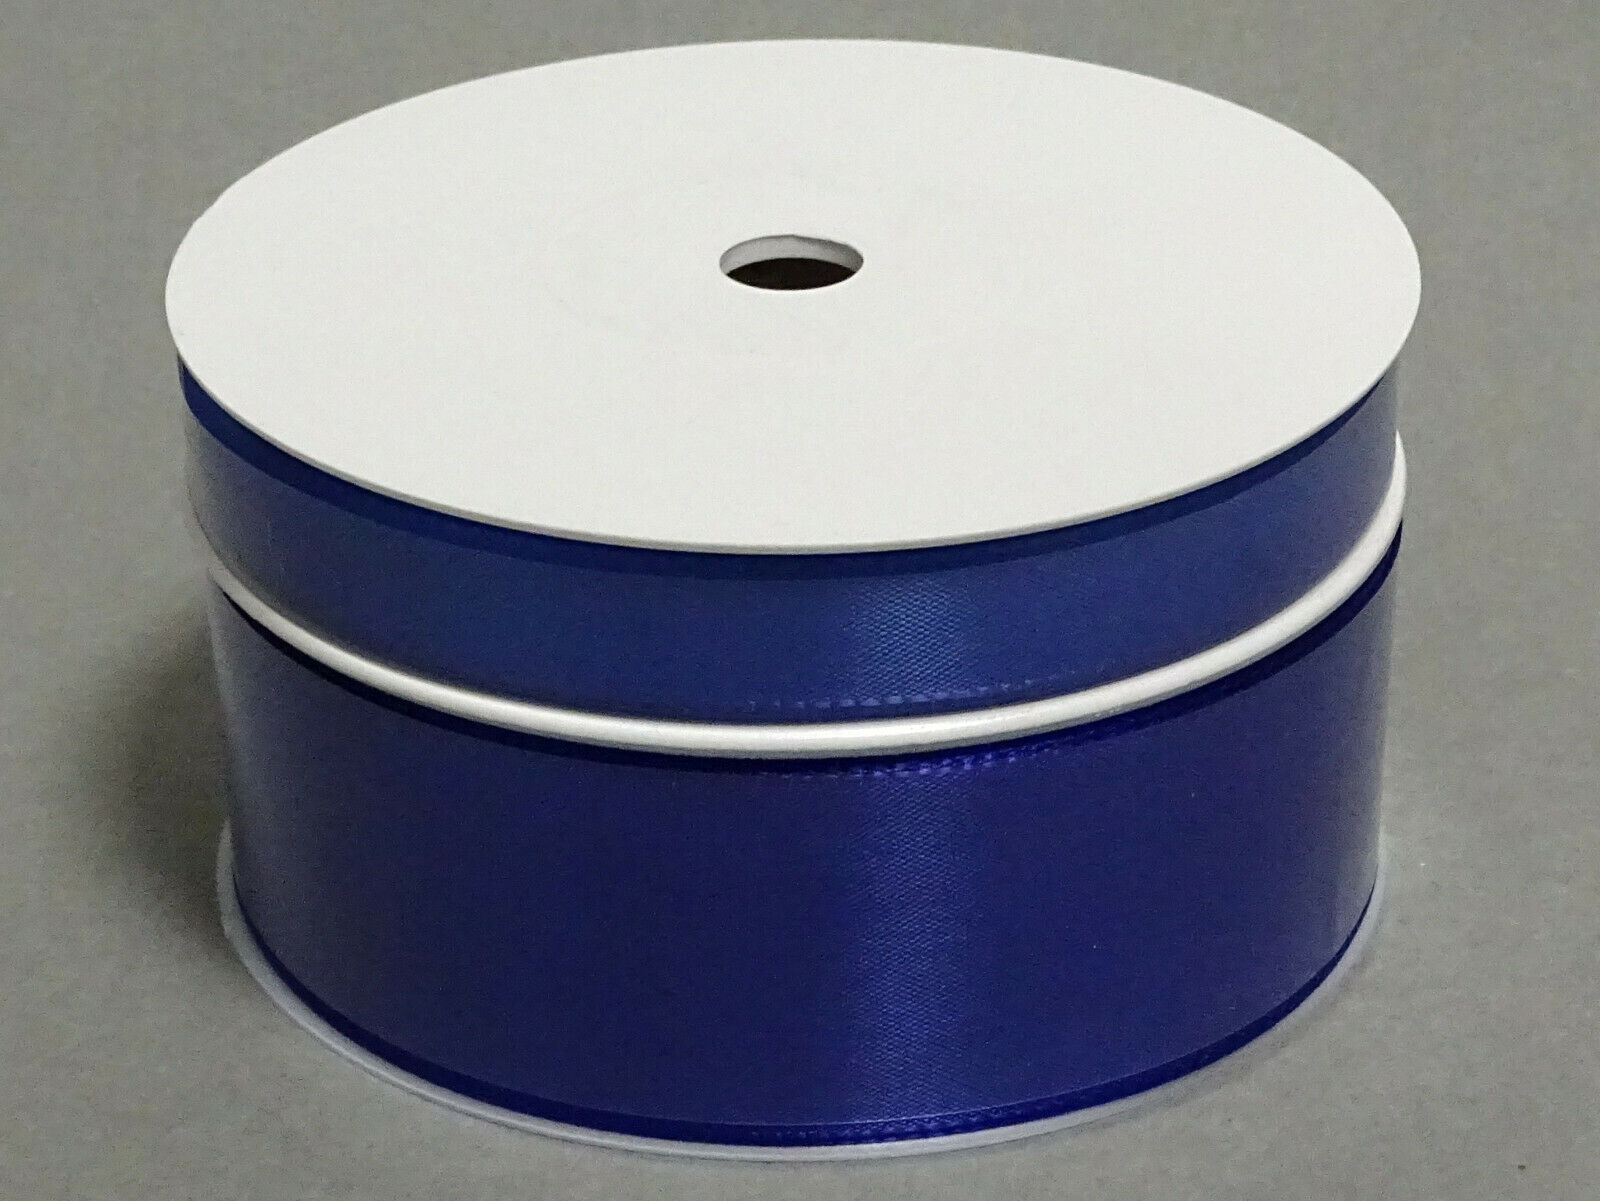 Seidenband Schleifenband 50 m x 15 / 25 / 40mm Dekoband ab 0,08€/m Geschenkband  - Königsblau 120, 40 mm x 50 m